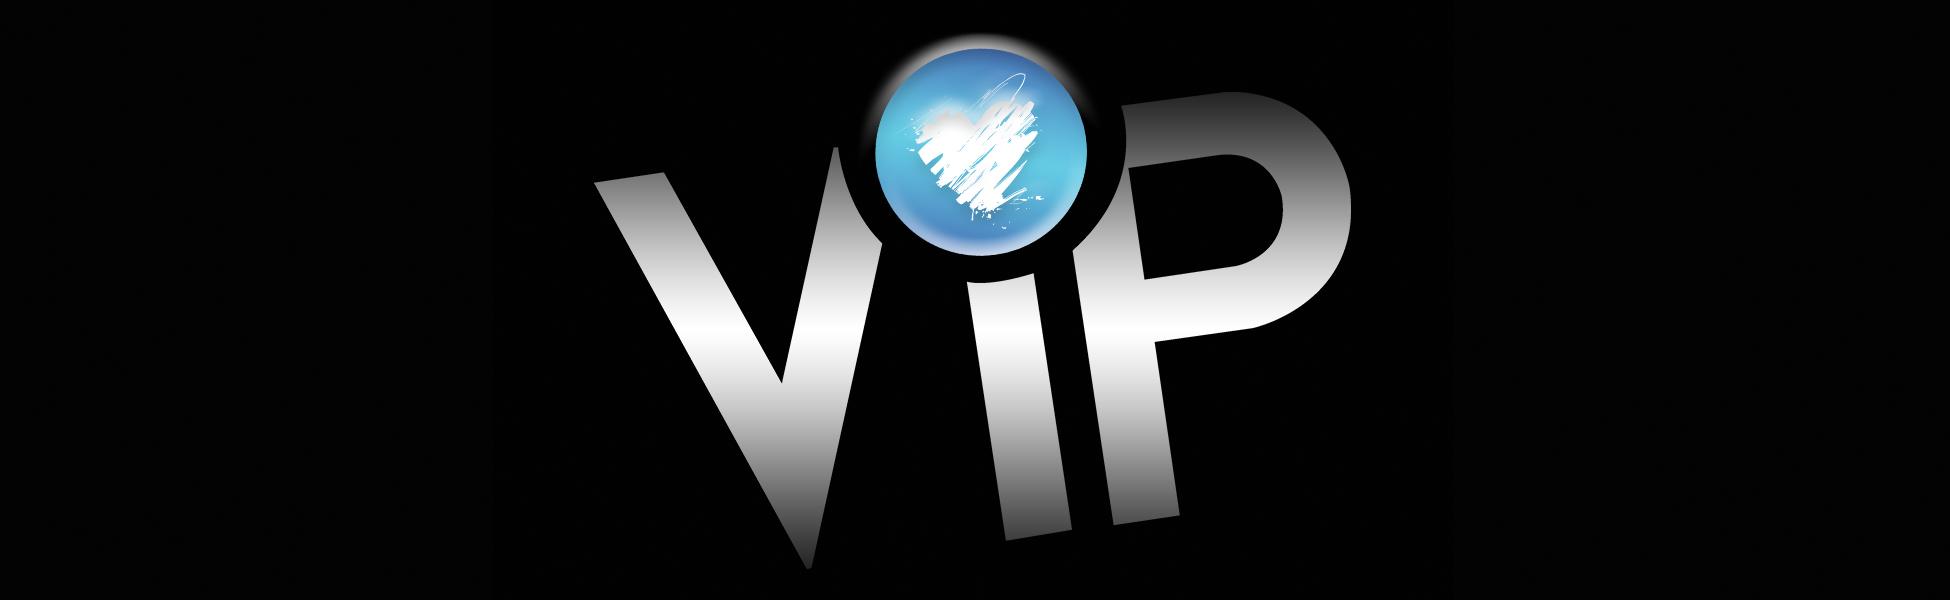 VIPstep.jpg